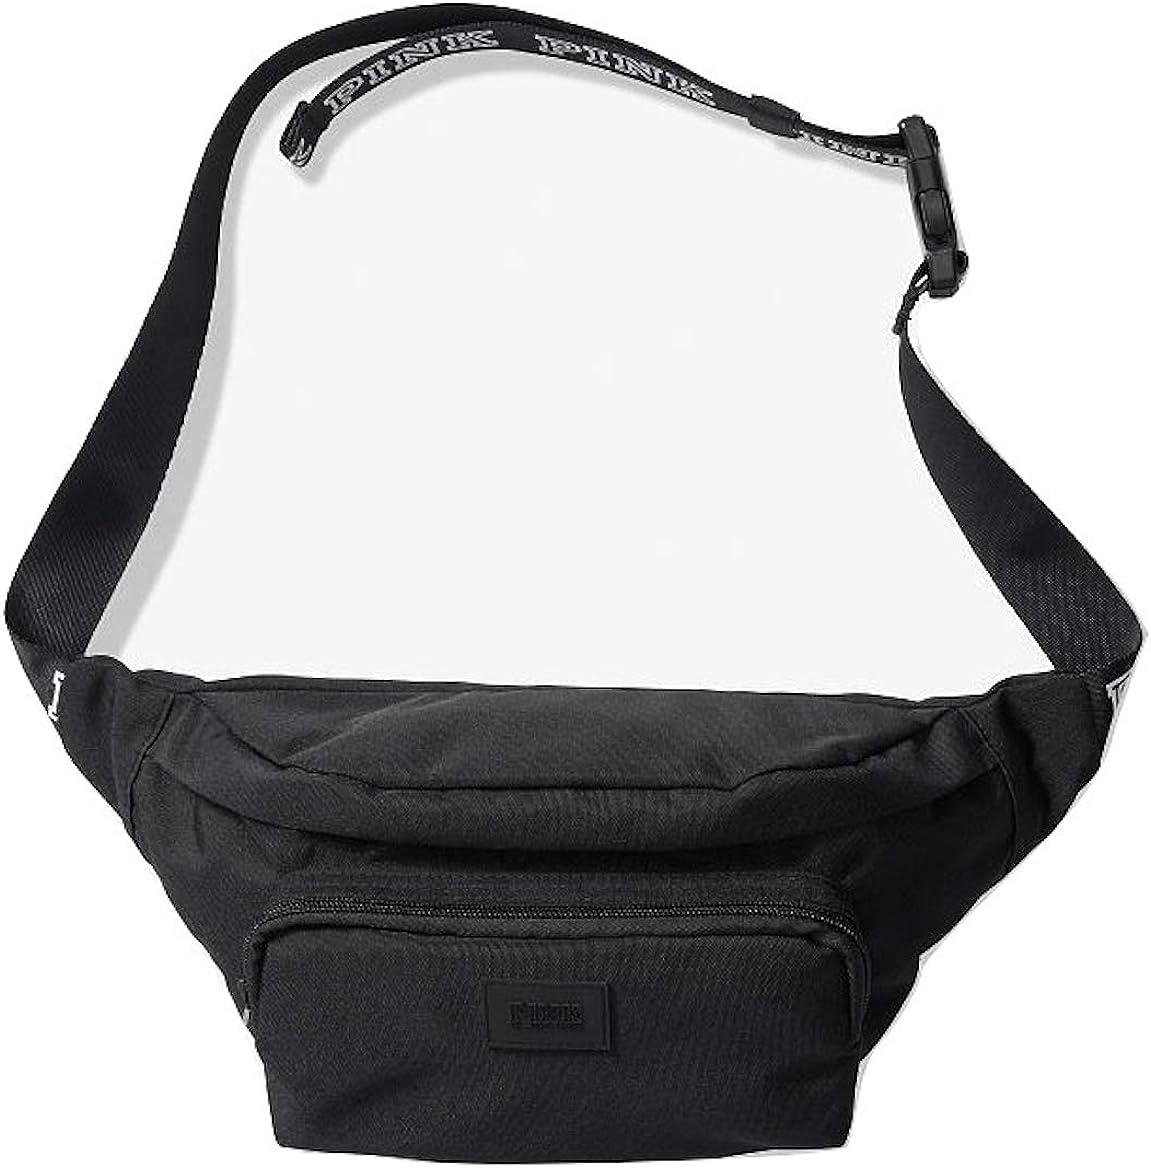 PINK Victoria/'s Secret VS Womens Fanny Pack Belt Bag Waist Phone Pocket Travel